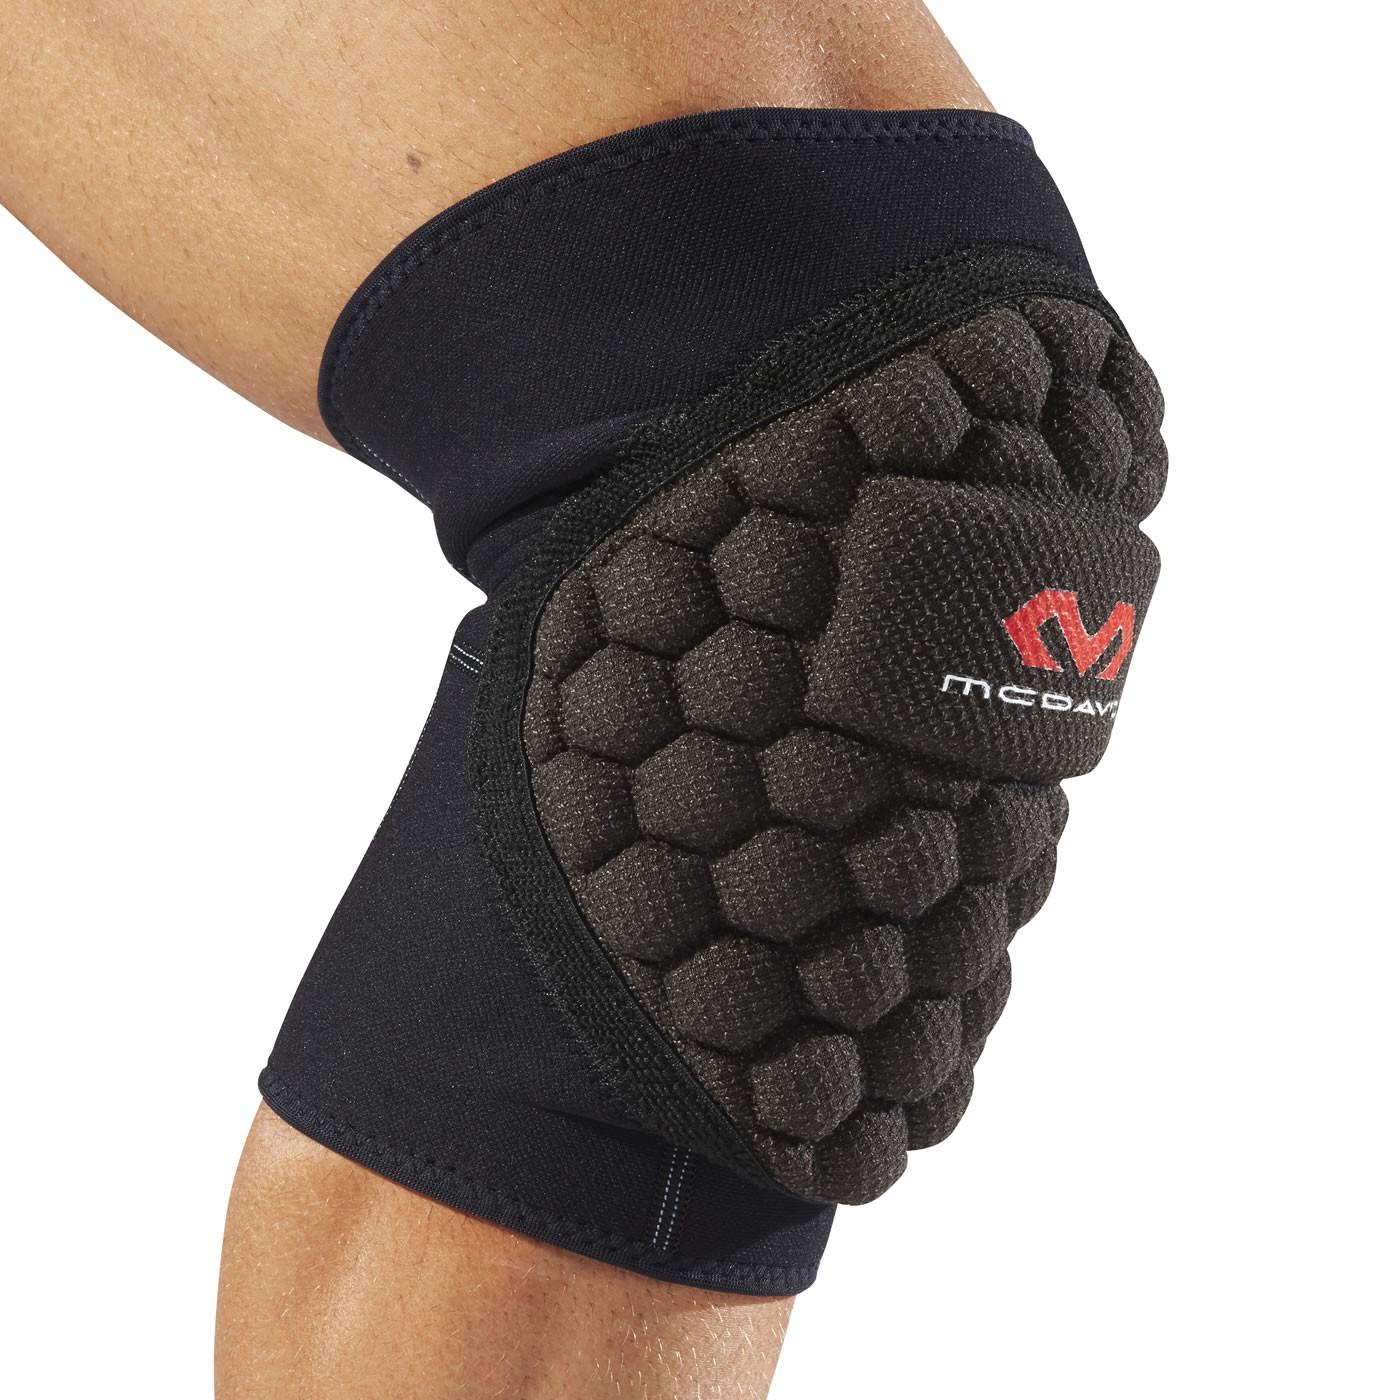 MCDAVID Pro Indoor/Handball Knee Pad 670R